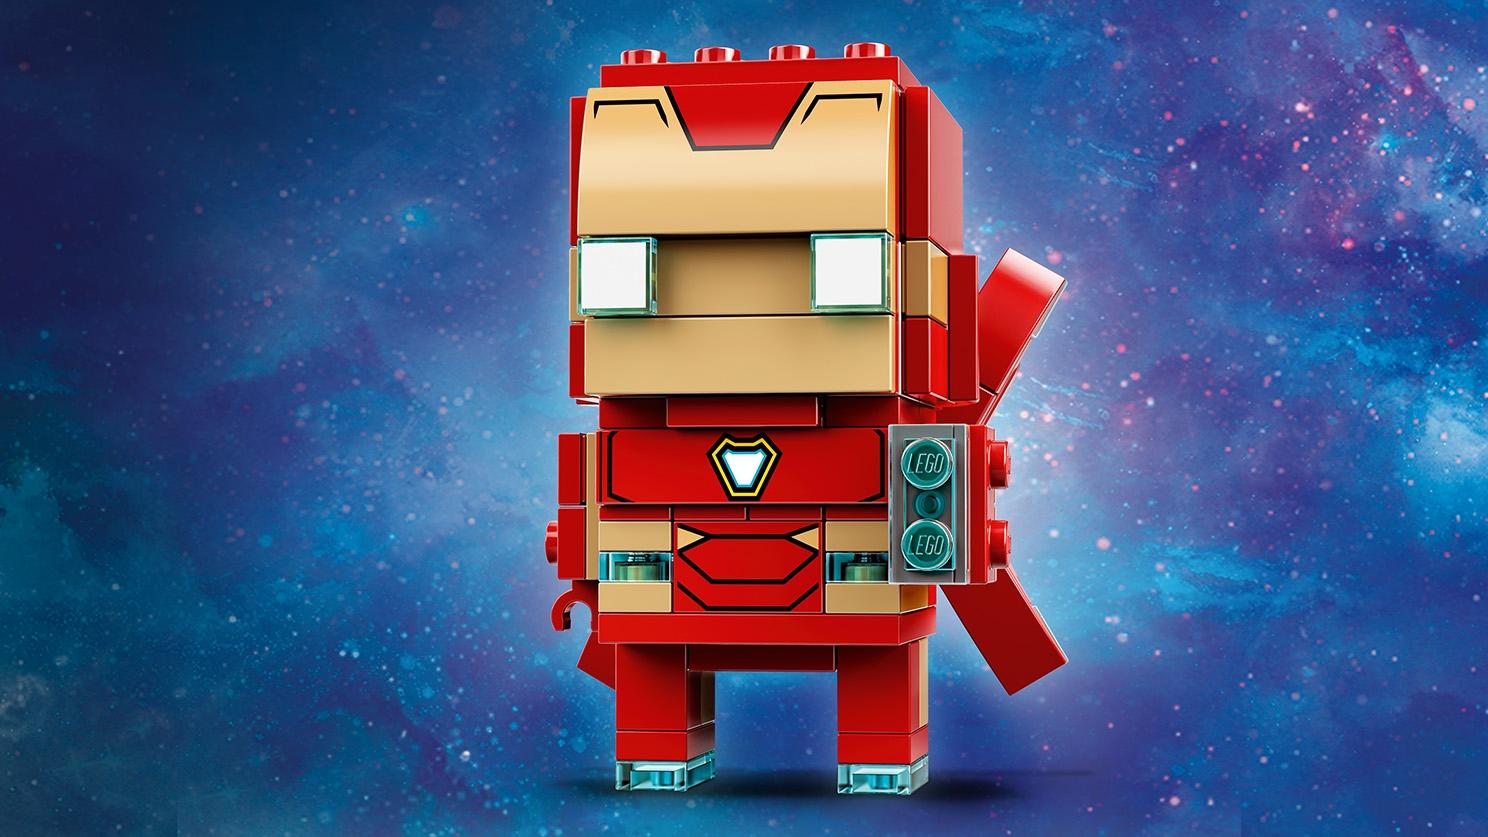 LEGO Brickheadz - 41604 Iron Man MK50 - Build a LEGO Brickheadz figure of Iron Man MK 50 in his red and gold super hero suit.